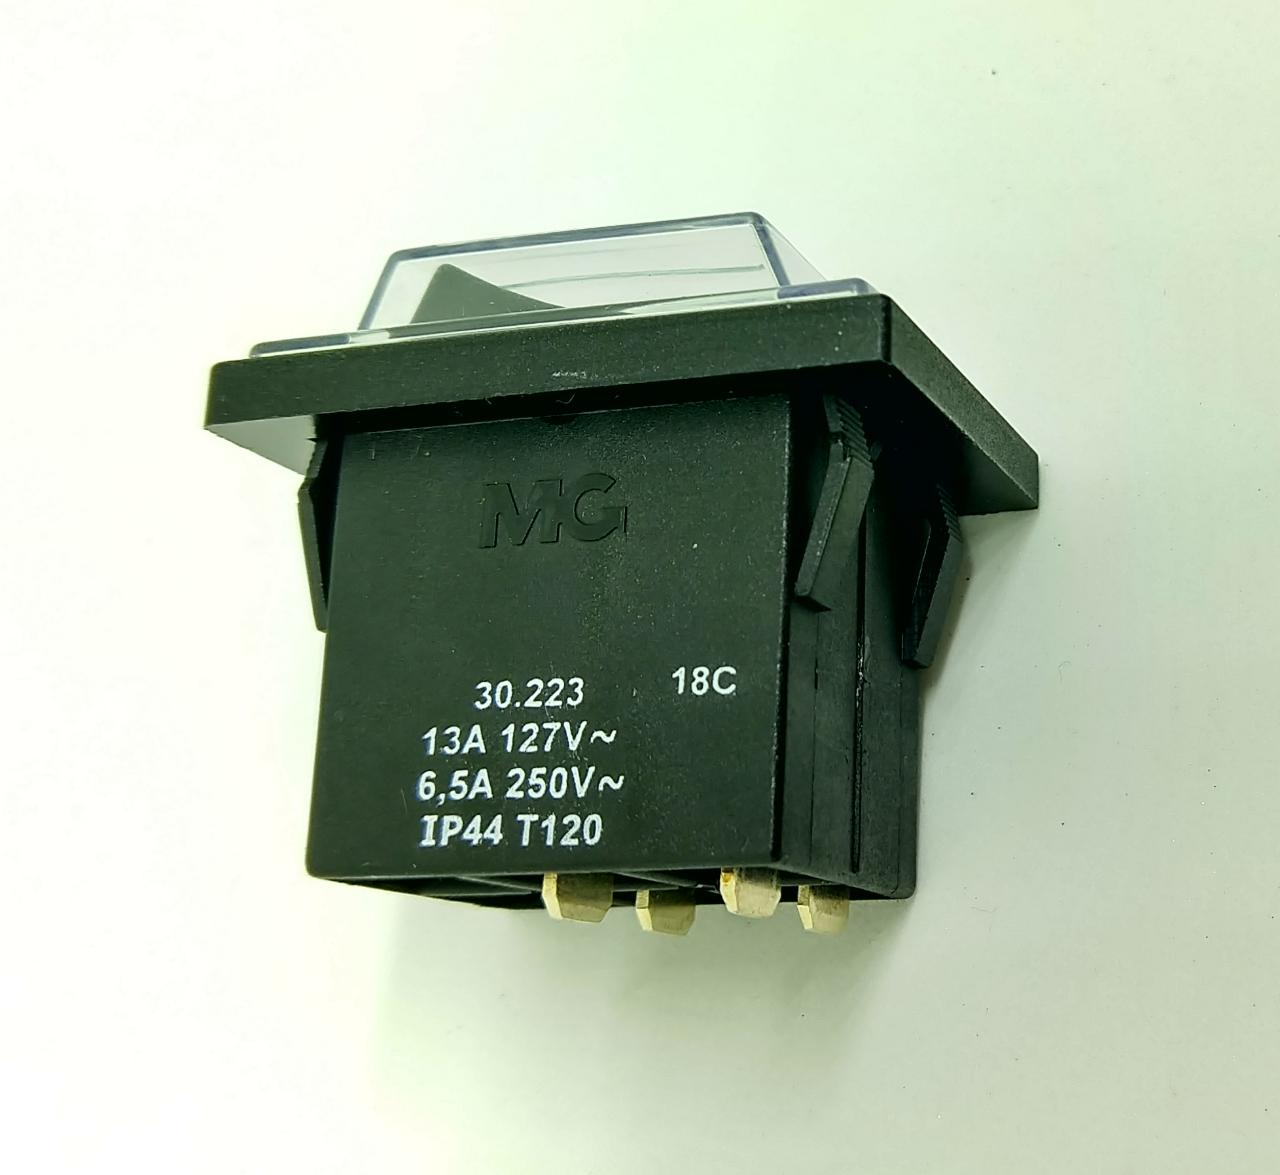 CHAVE INTERRUPTOR ELECTROLUX COM CAPA 16A (64400488)  - HL SERVICE